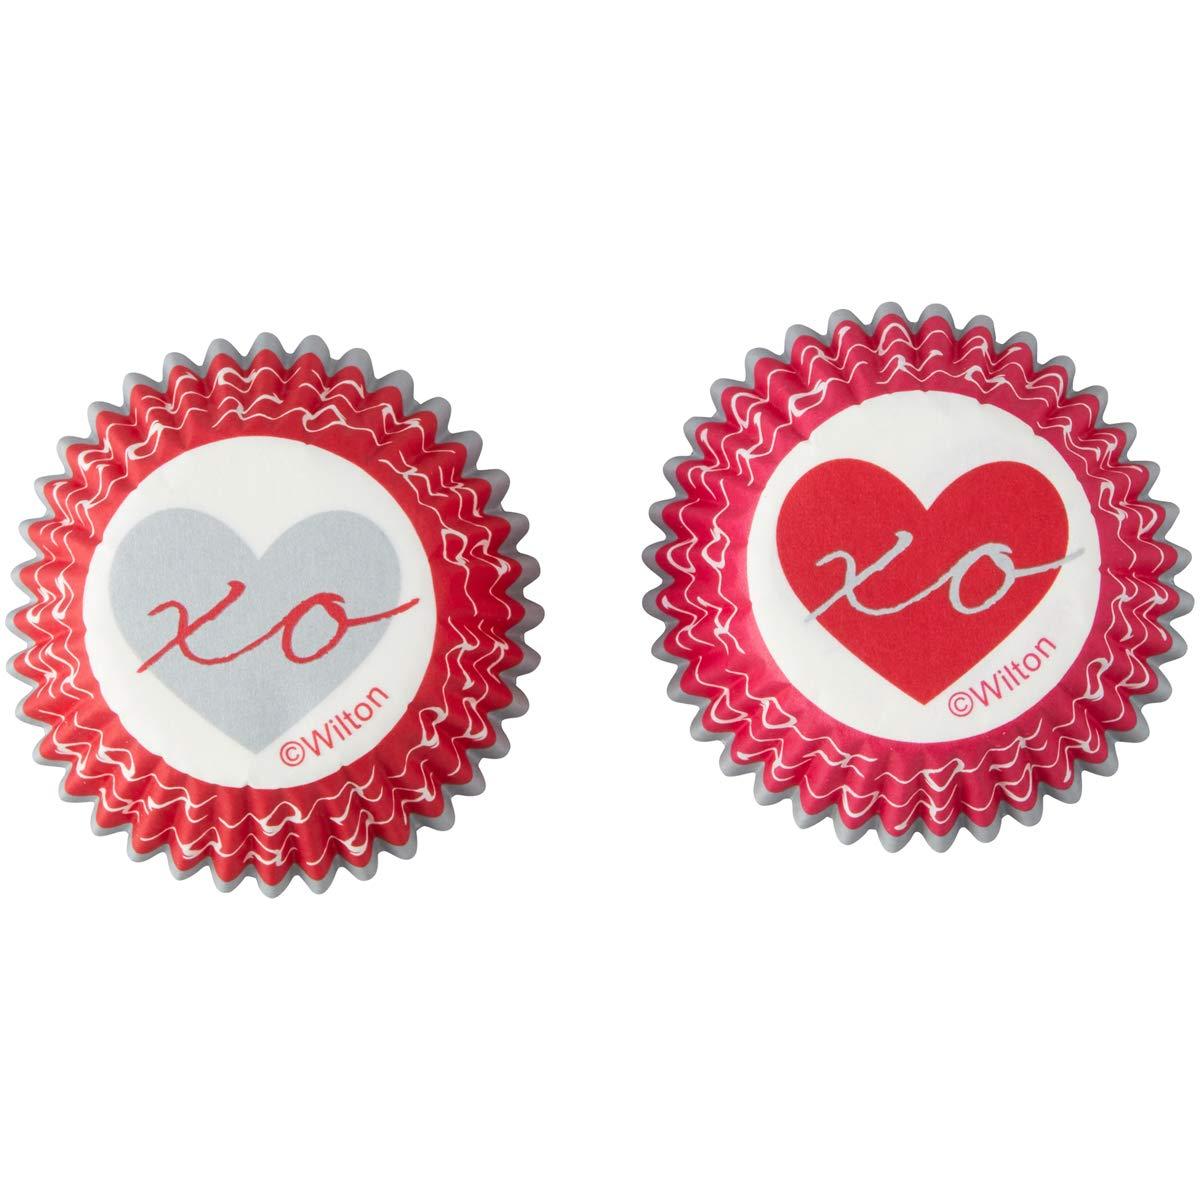 Wilton 415-5516 Heartfelt Valentine Mini Baking Cups